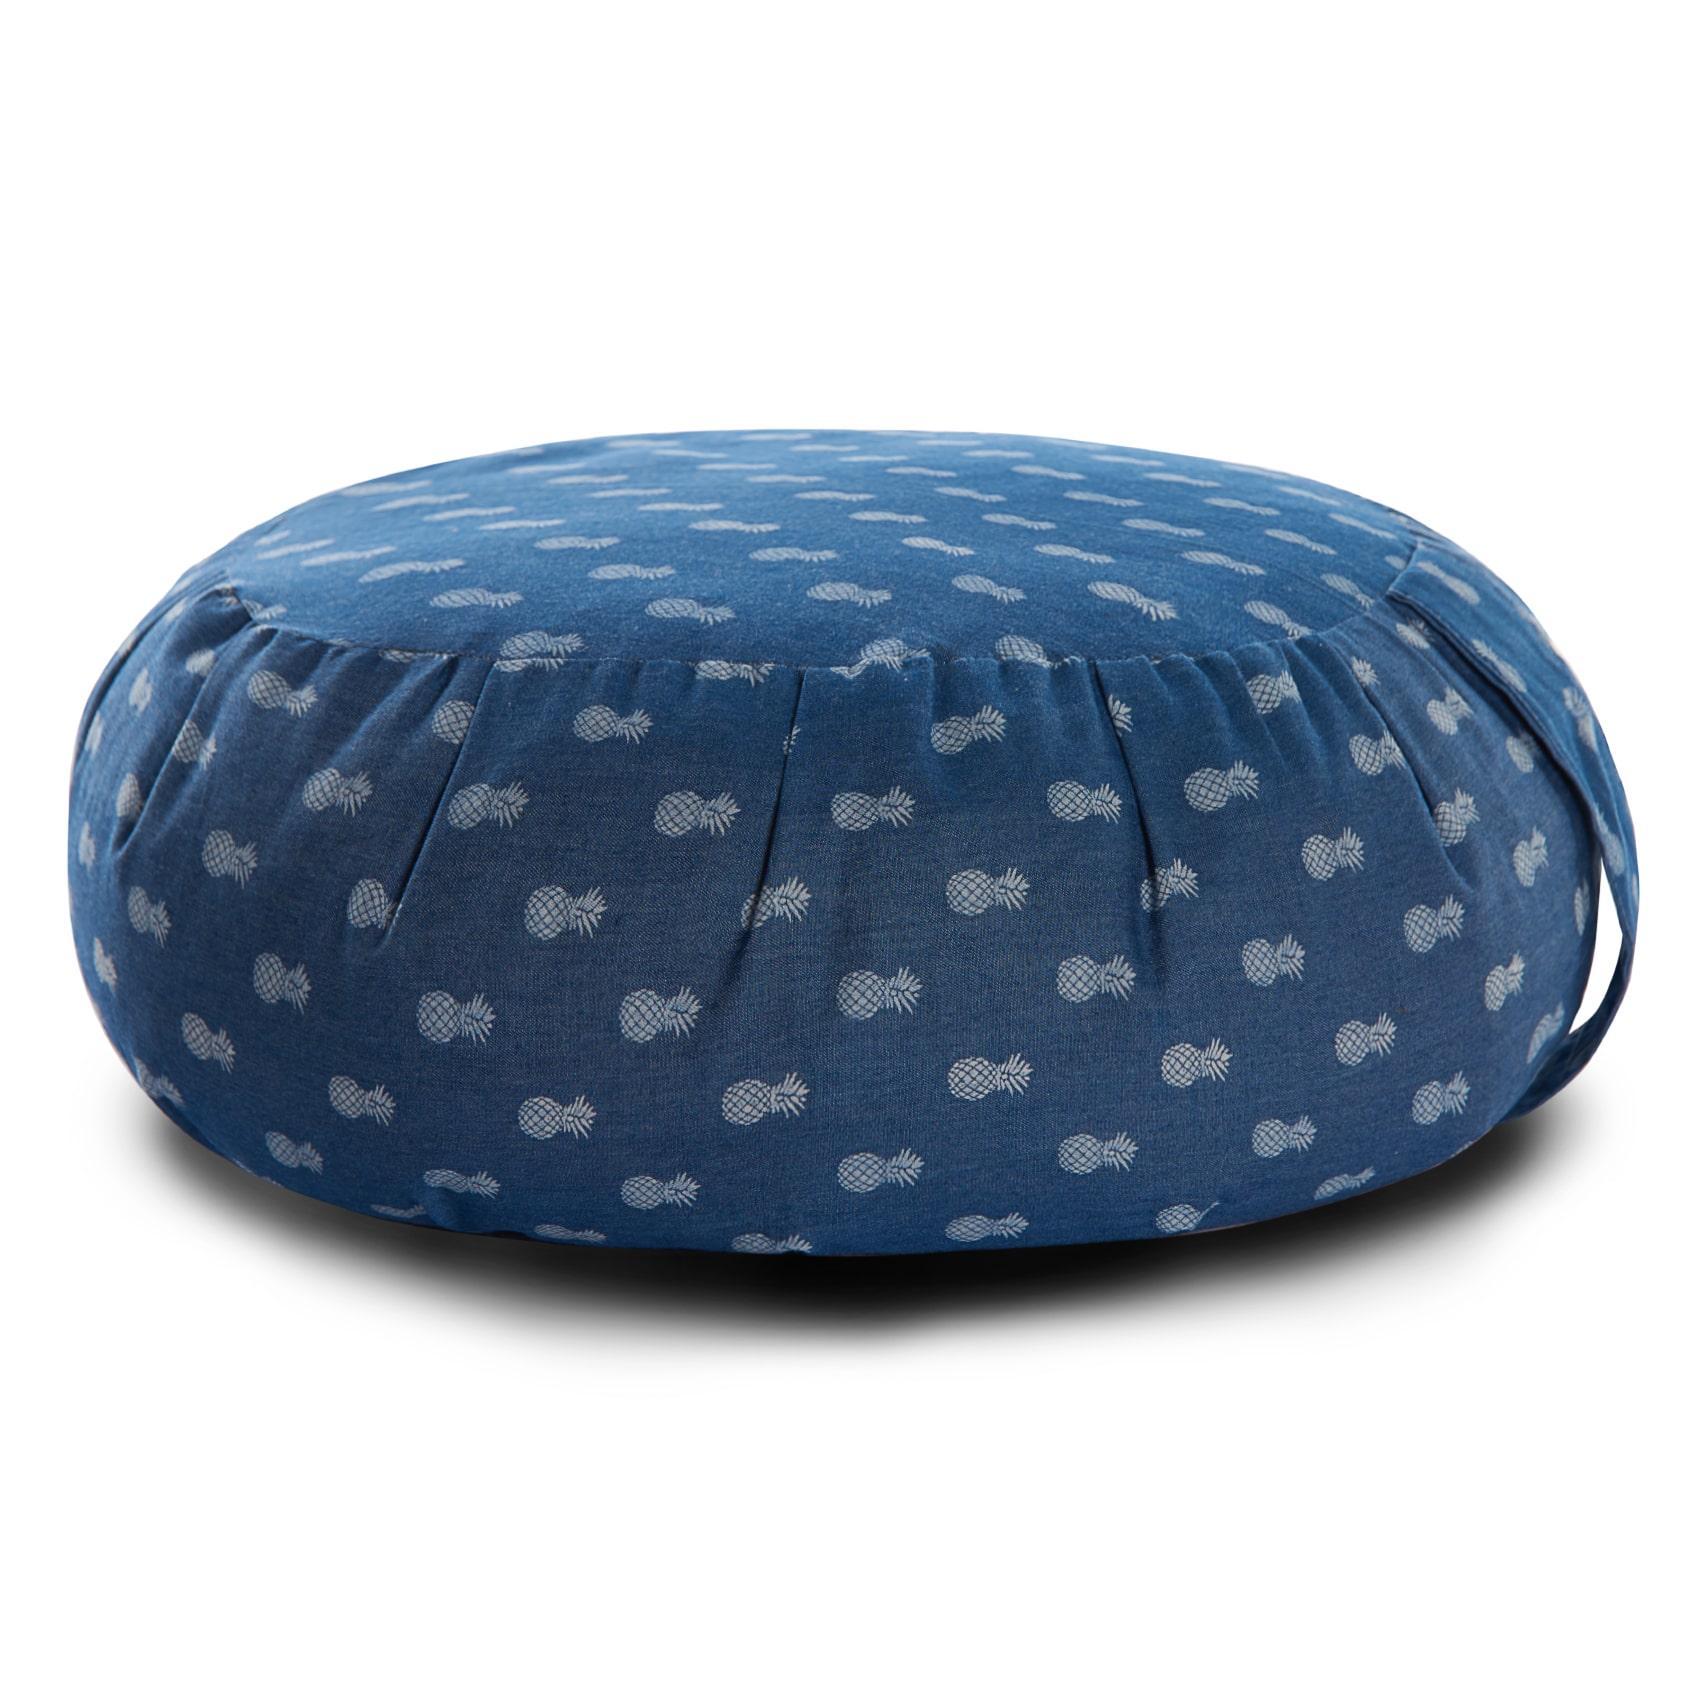 coussin de m ditation zafu tooty fruity libre comme l 39 air. Black Bedroom Furniture Sets. Home Design Ideas